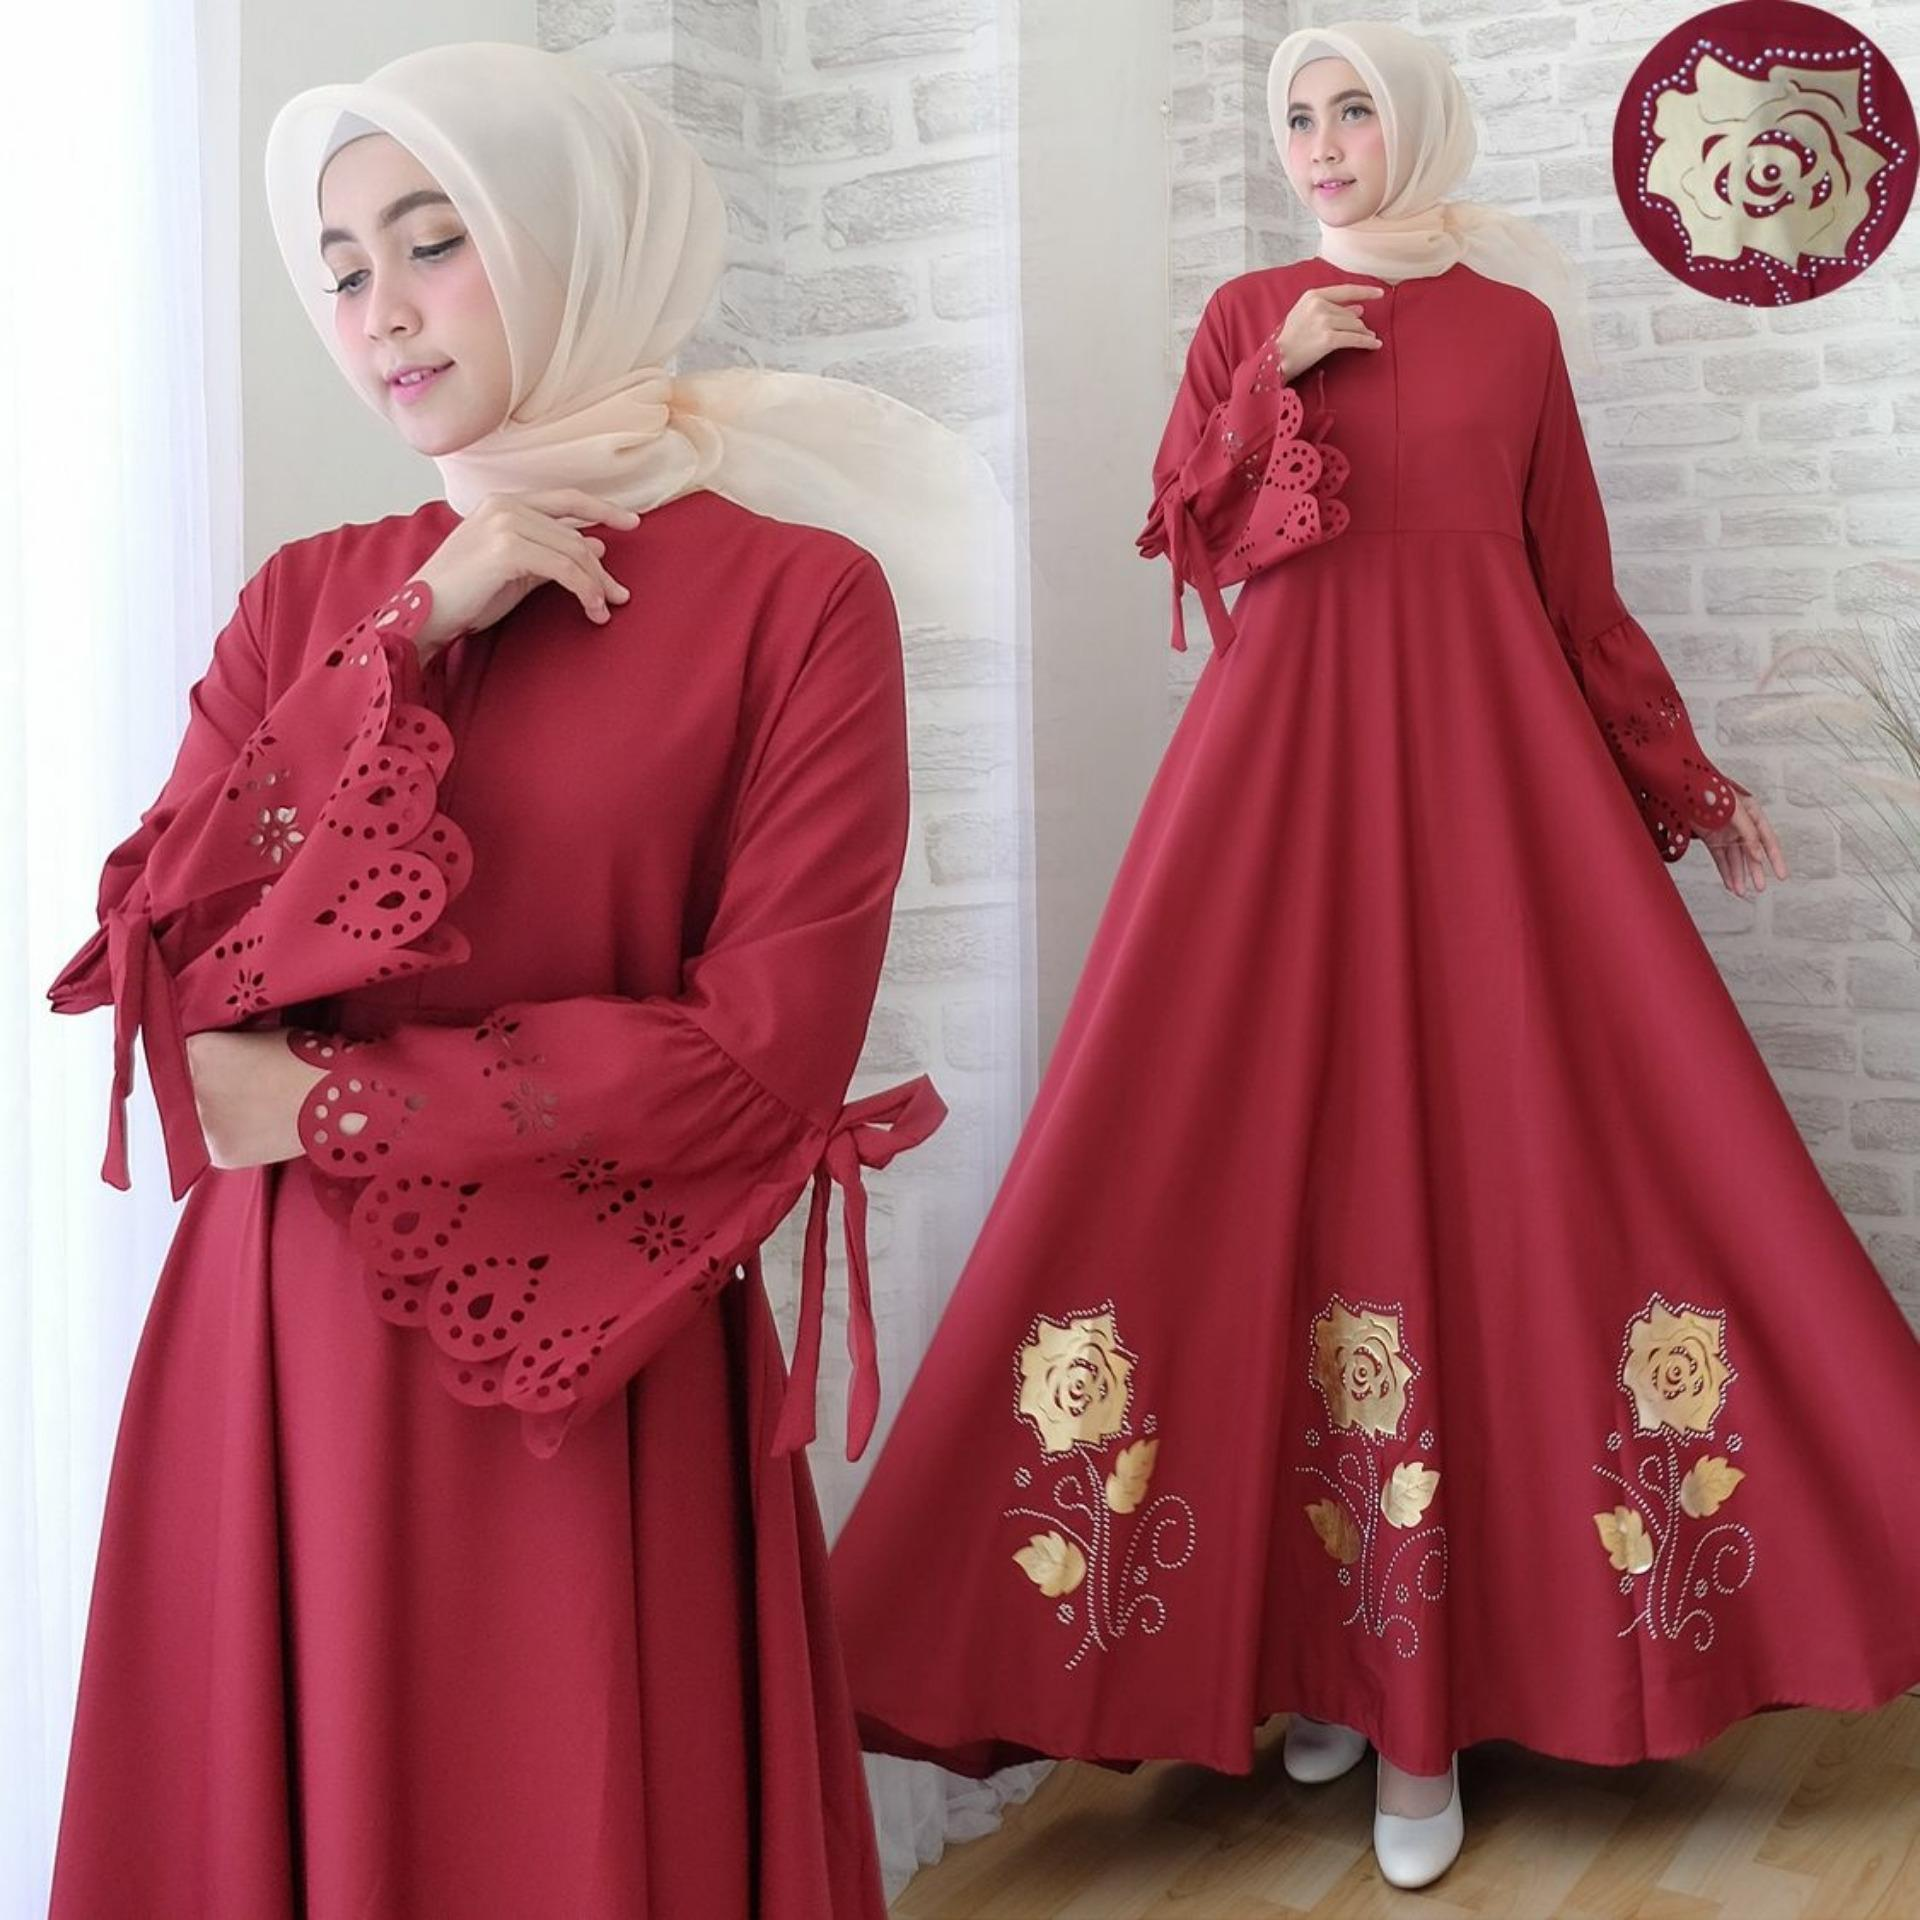 Toko Snowshop Gamis Syari Kayla Maroon Baju Muslim Fashion Wanita Baju Wanita Baju Gamis Busui Gaun Baloteli Xl Jumbo Syari Online Terpercaya